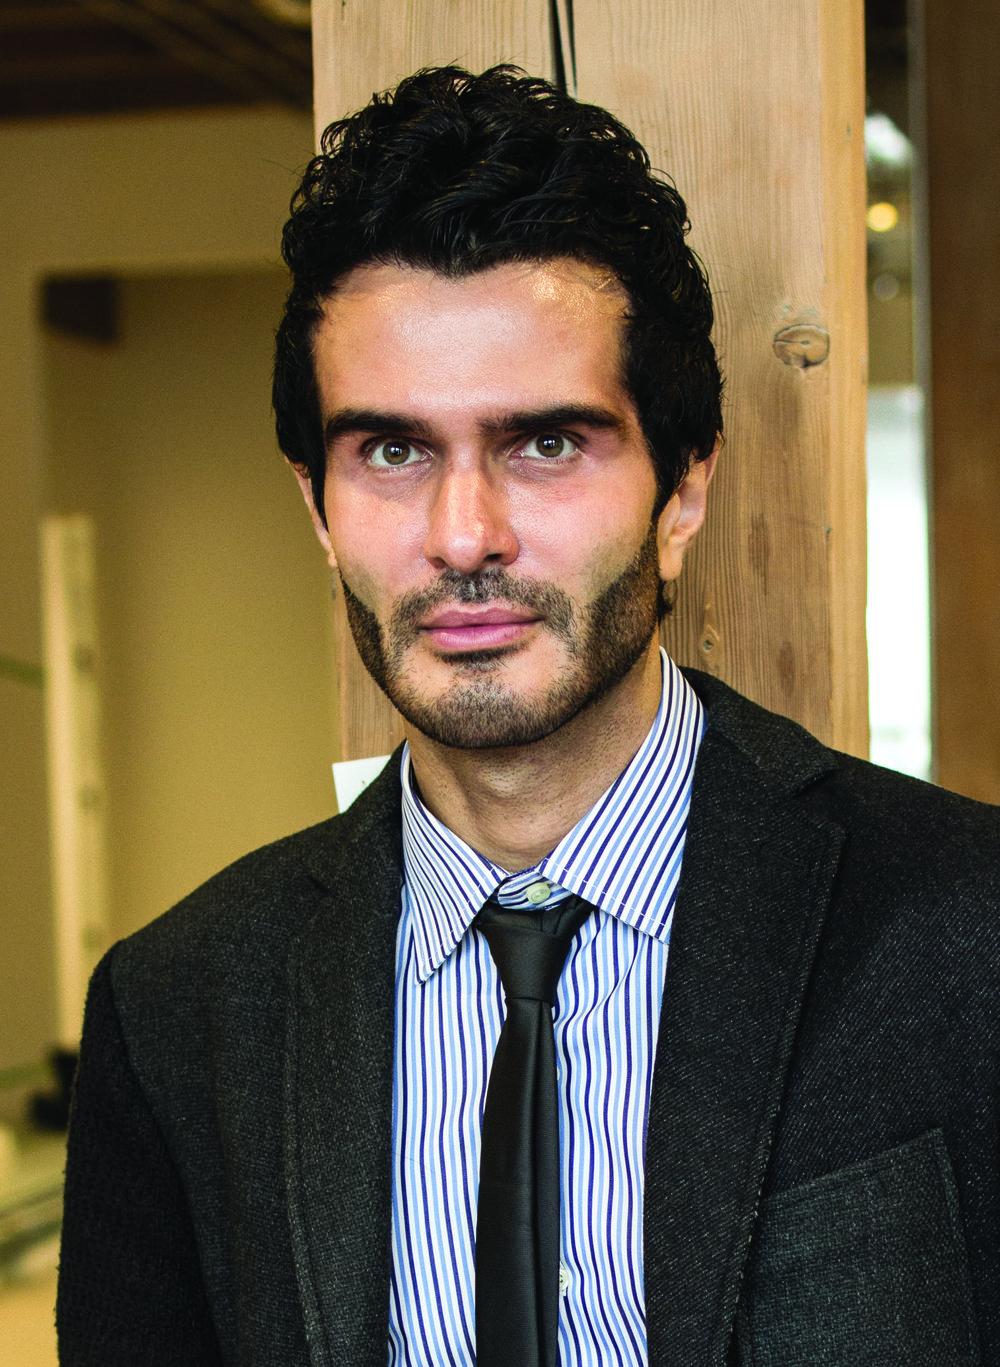 Brandon Truaxe, founder of Deciem - 'The Abnormal Beauty Company'